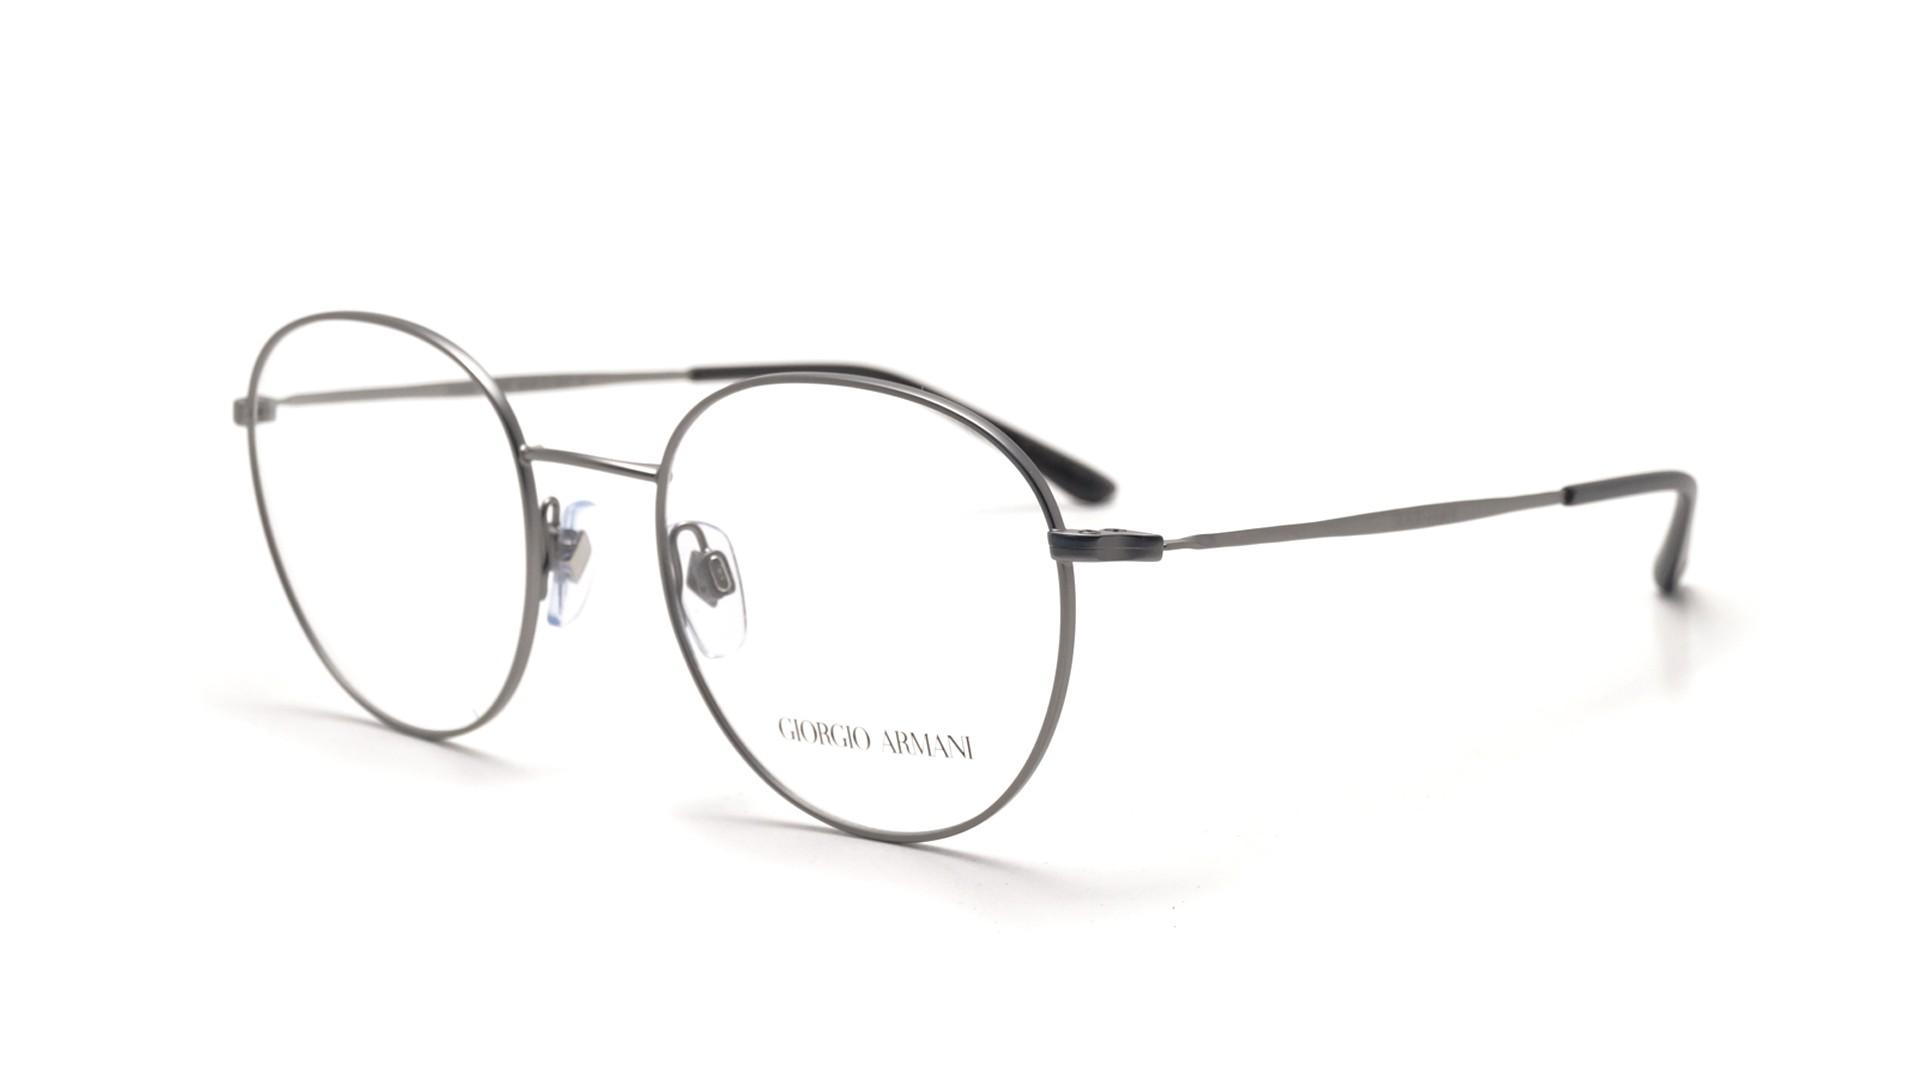 Giorgio Armani Frames Of Life Eyeglasses « Heritage Malta